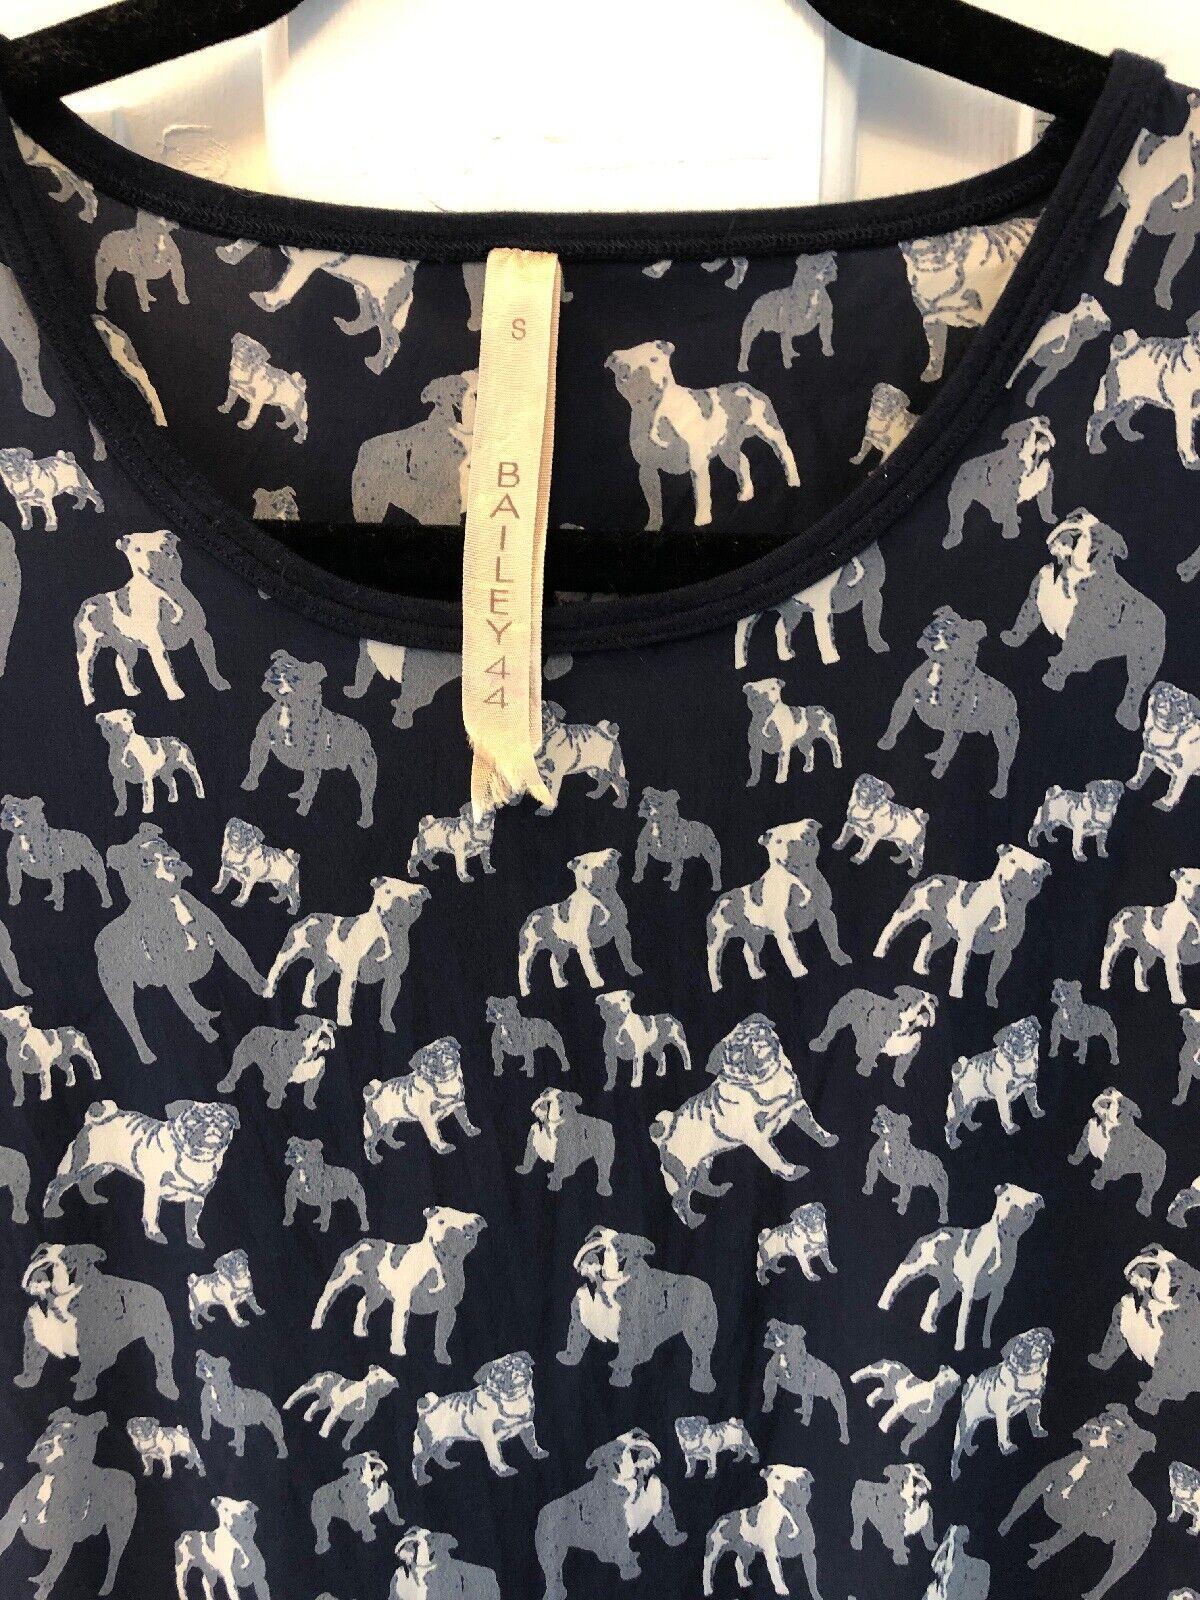 26. BAILEY 44 Epitaph to Dog Silk Bulldog Print Tee Shirt S Pug